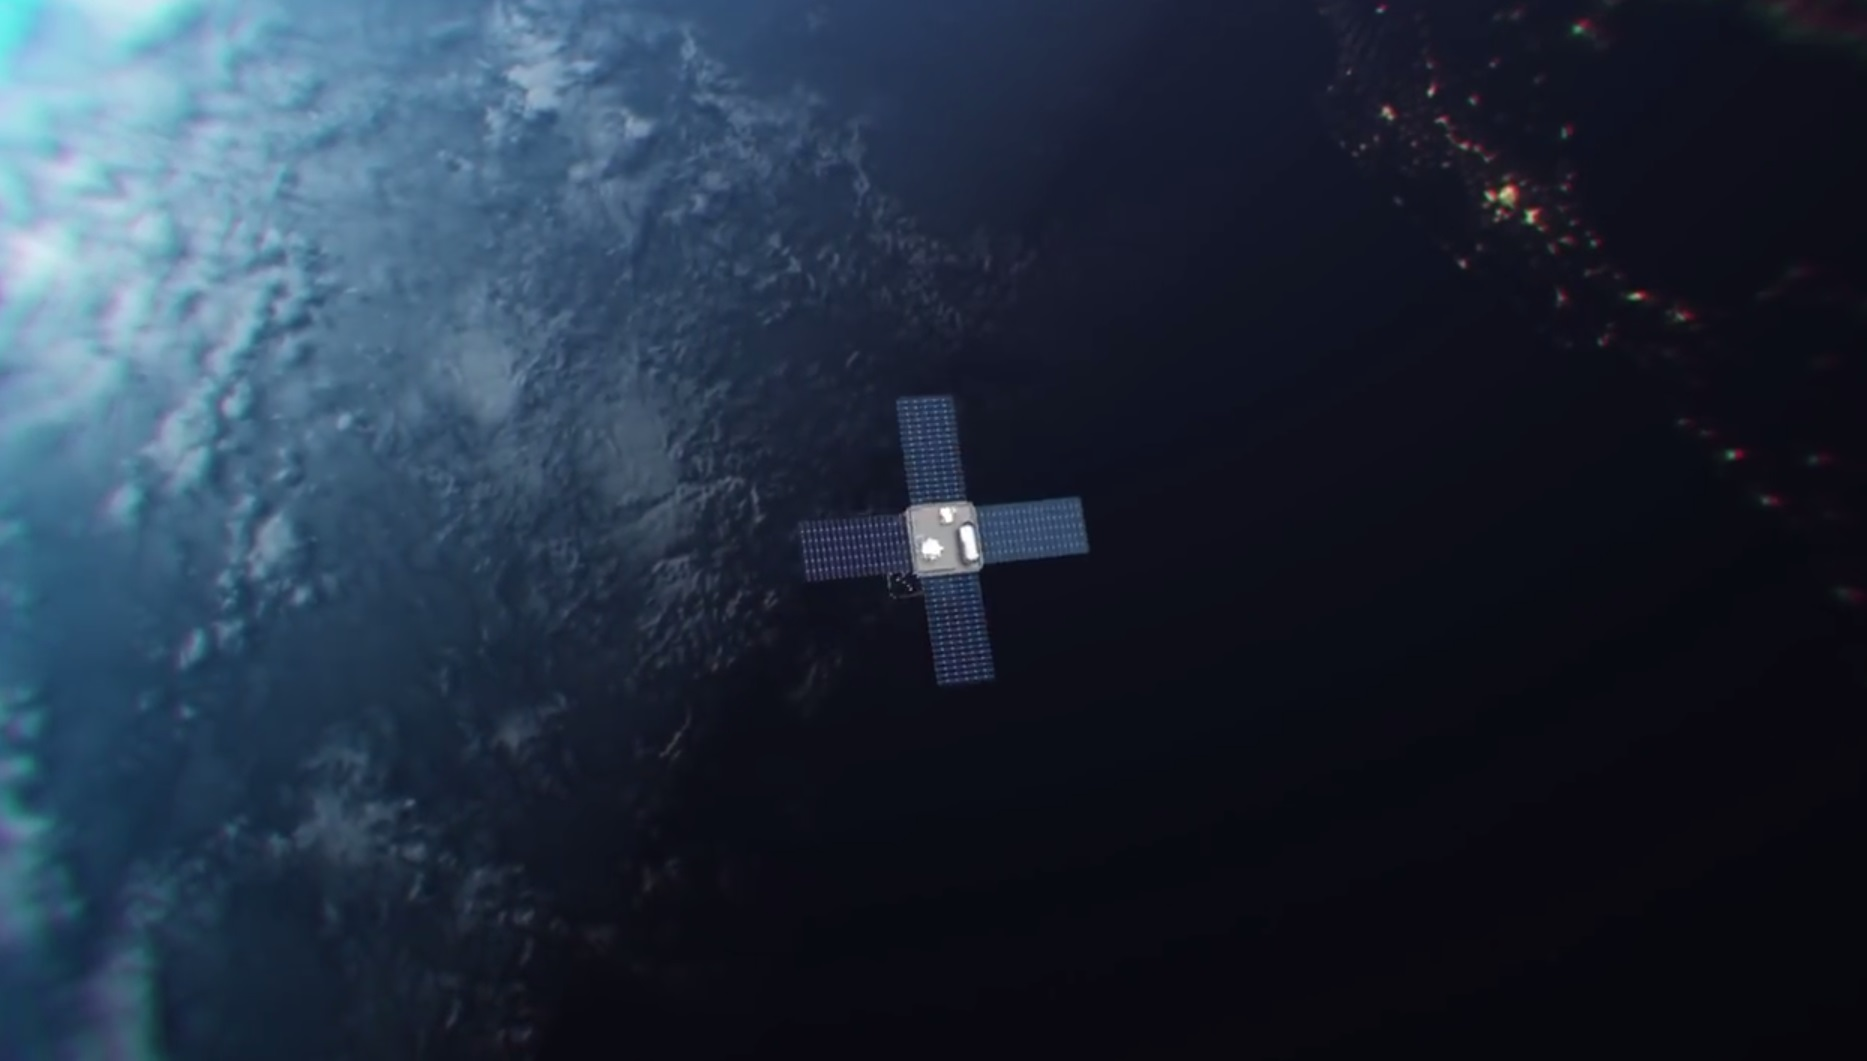 Облачно, вероятна неотключаемая реклама на звездном небе - 13